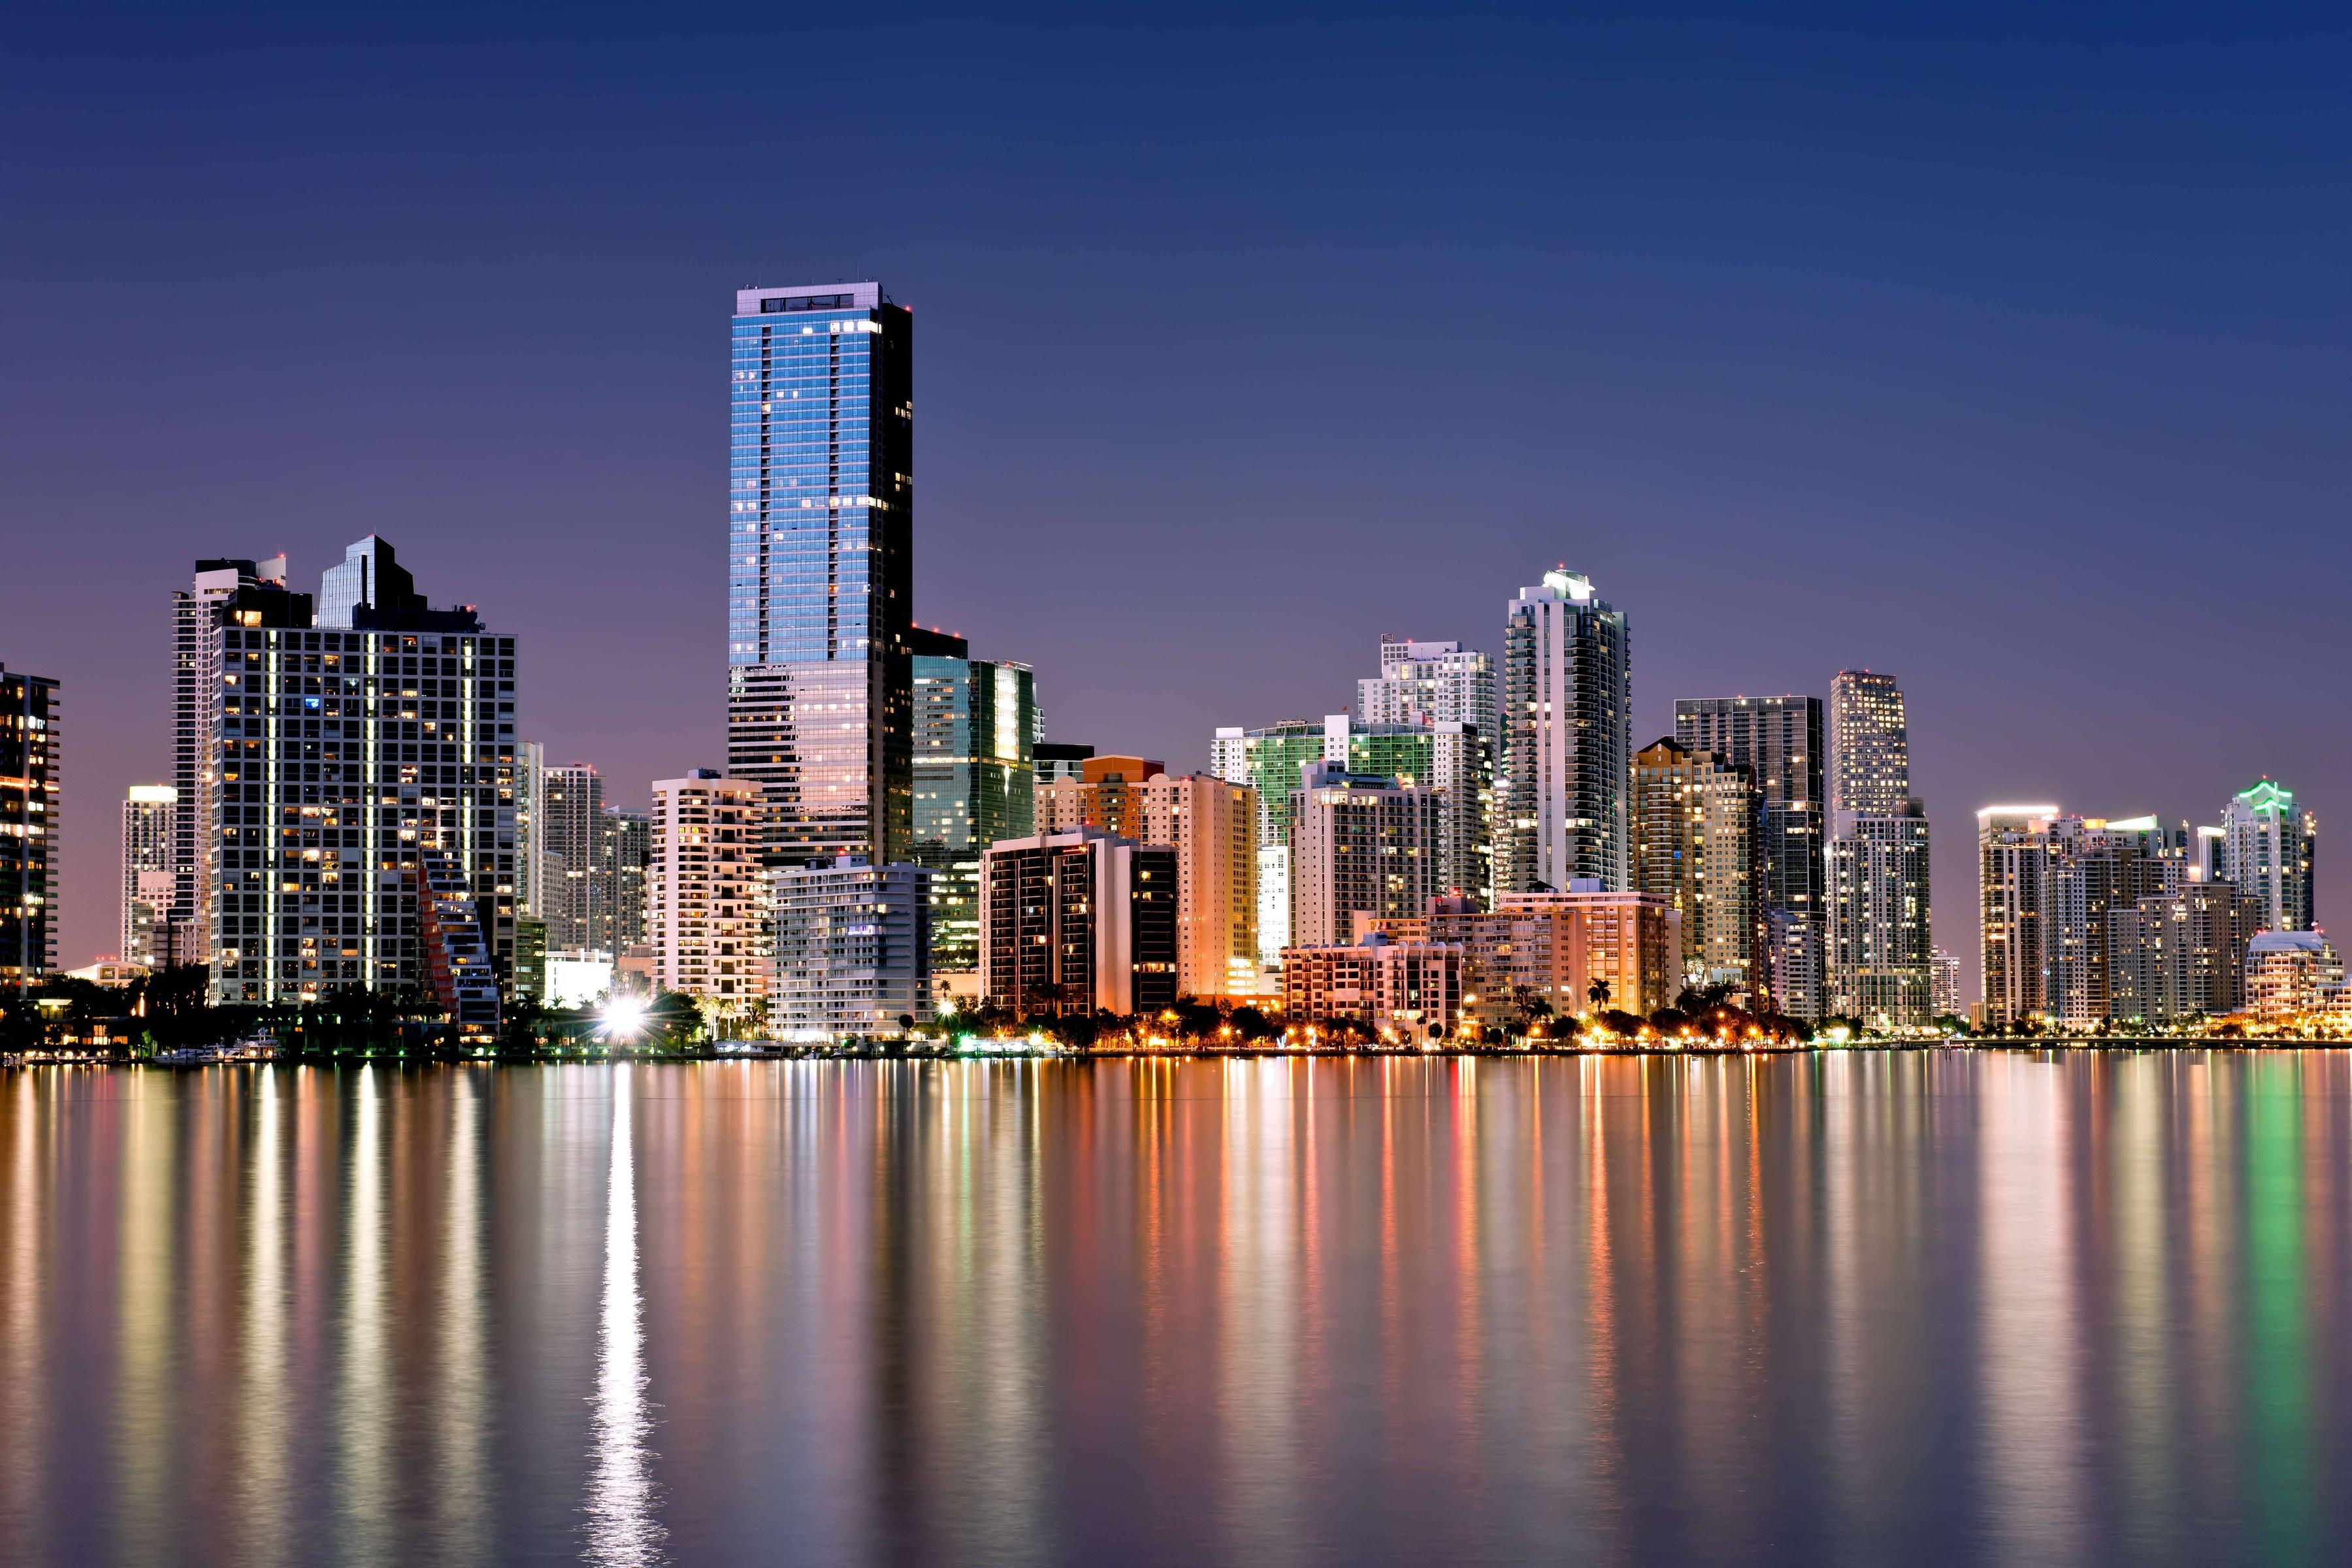 Miami Skyline Hd Wiring Diagrams Electronic Thermometer Circuit Diagram Tradeoficcom